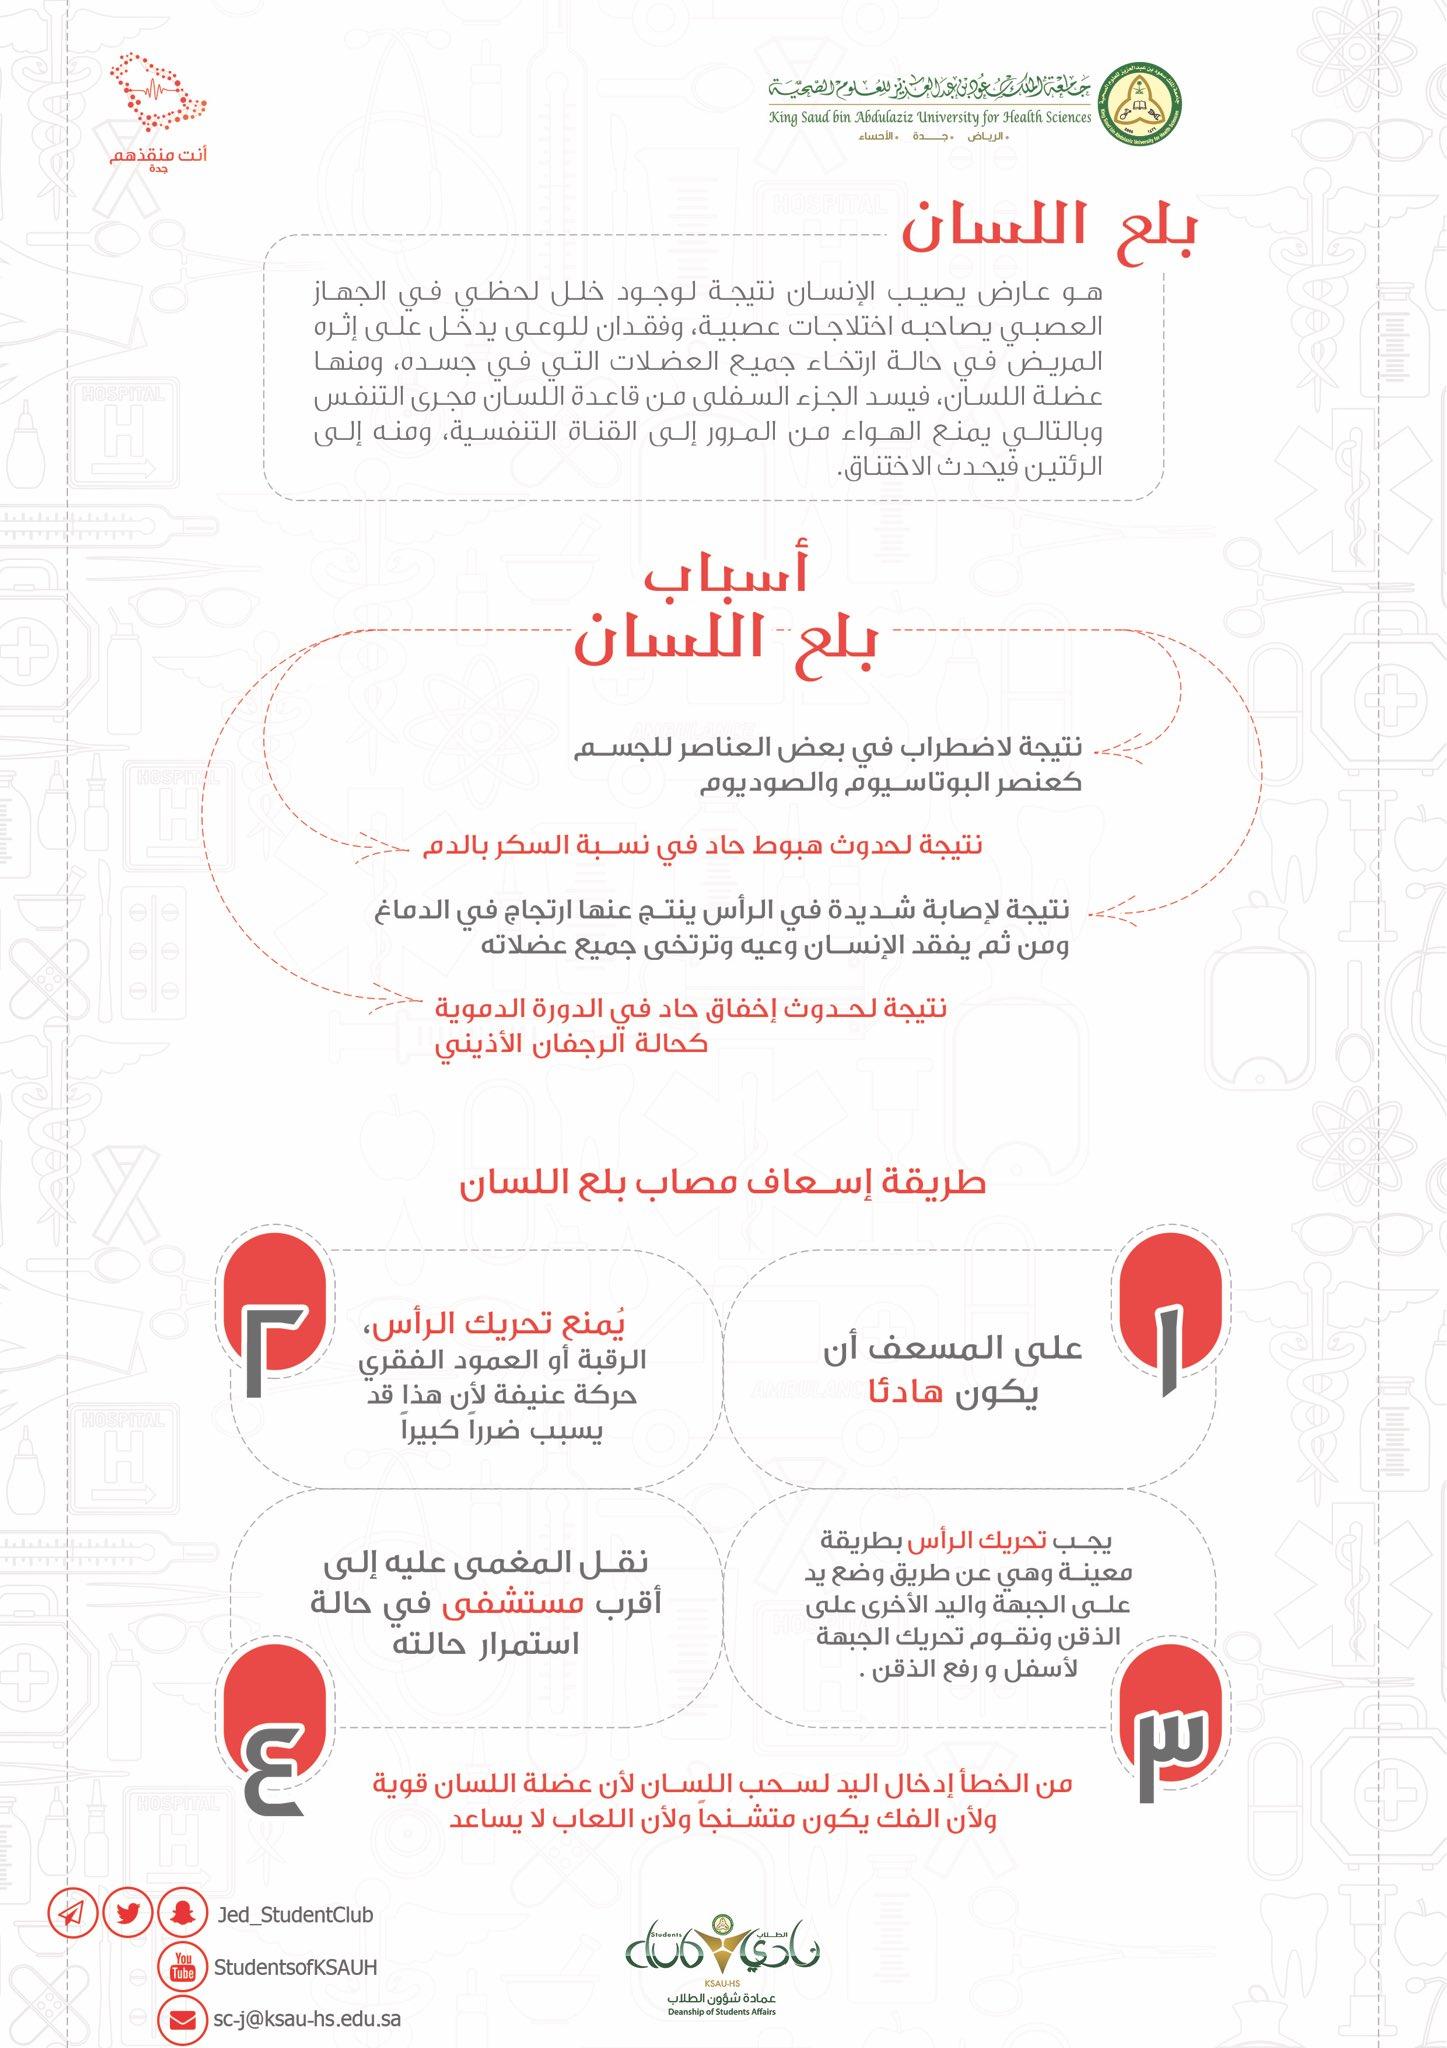 14e385691 نادي الطلاب - جدة on Twitter: